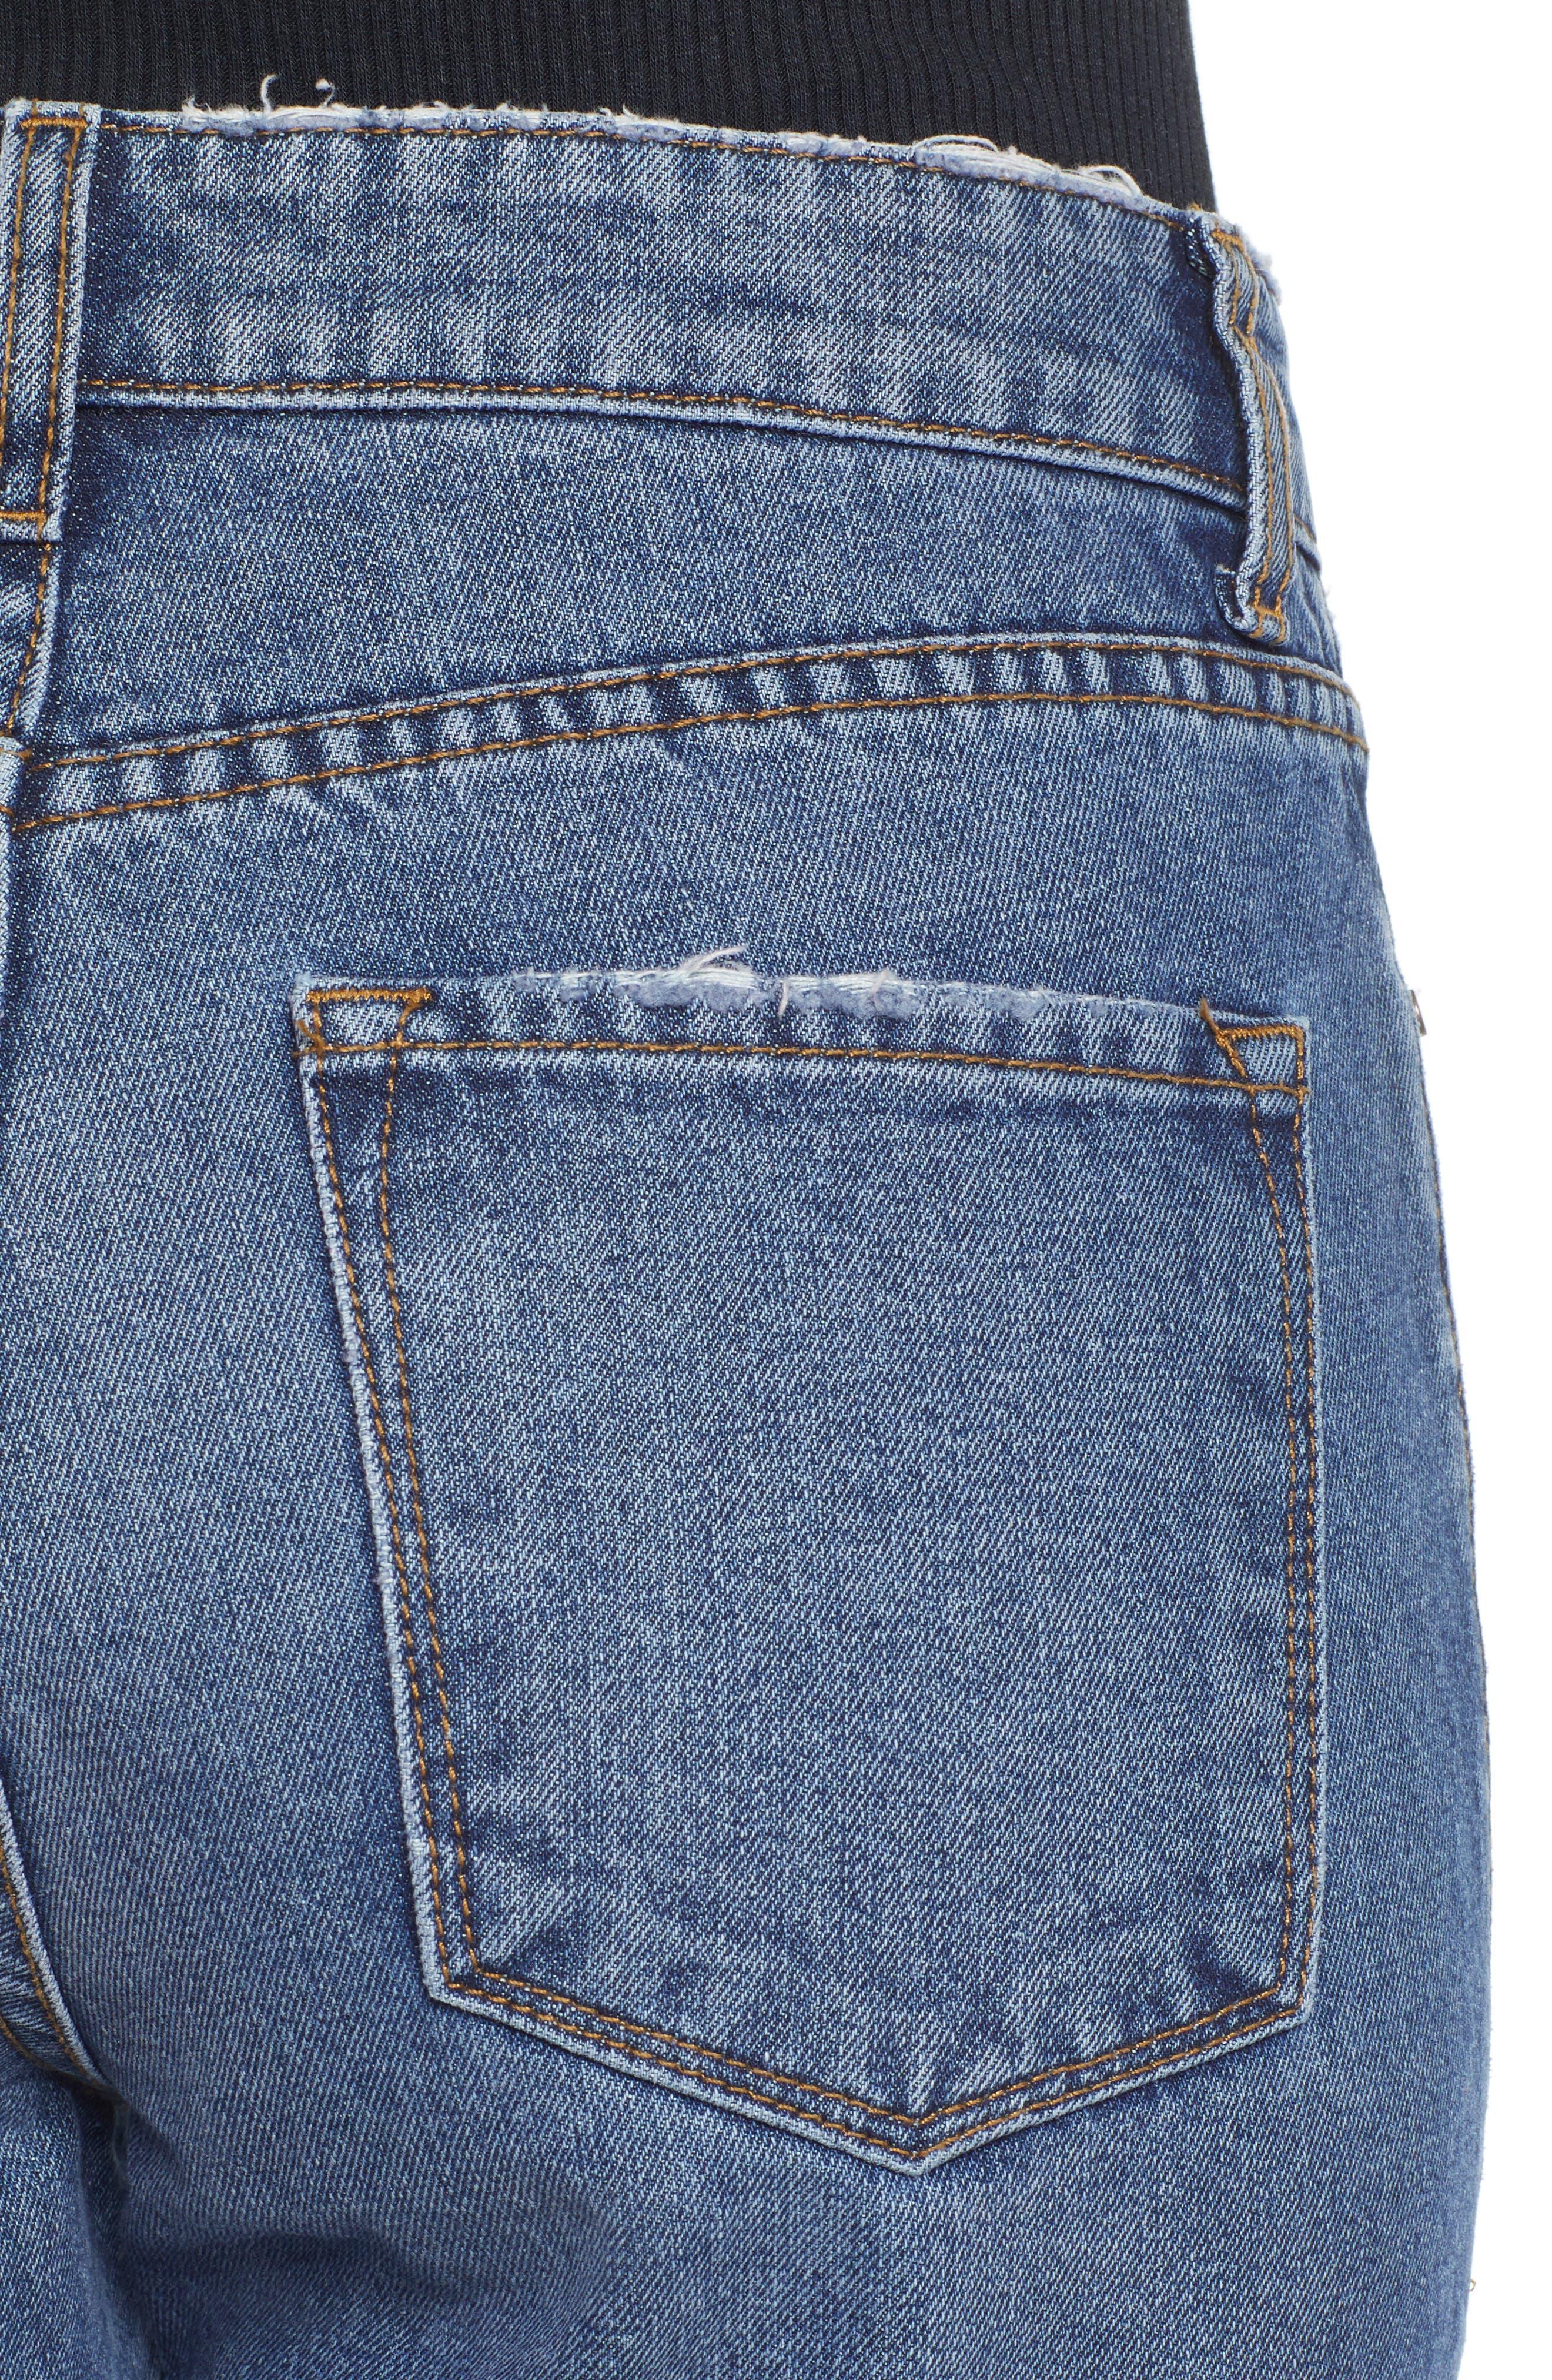 High Waist Straight Leg Crop Jeans,                             Alternate thumbnail 4, color,                             401